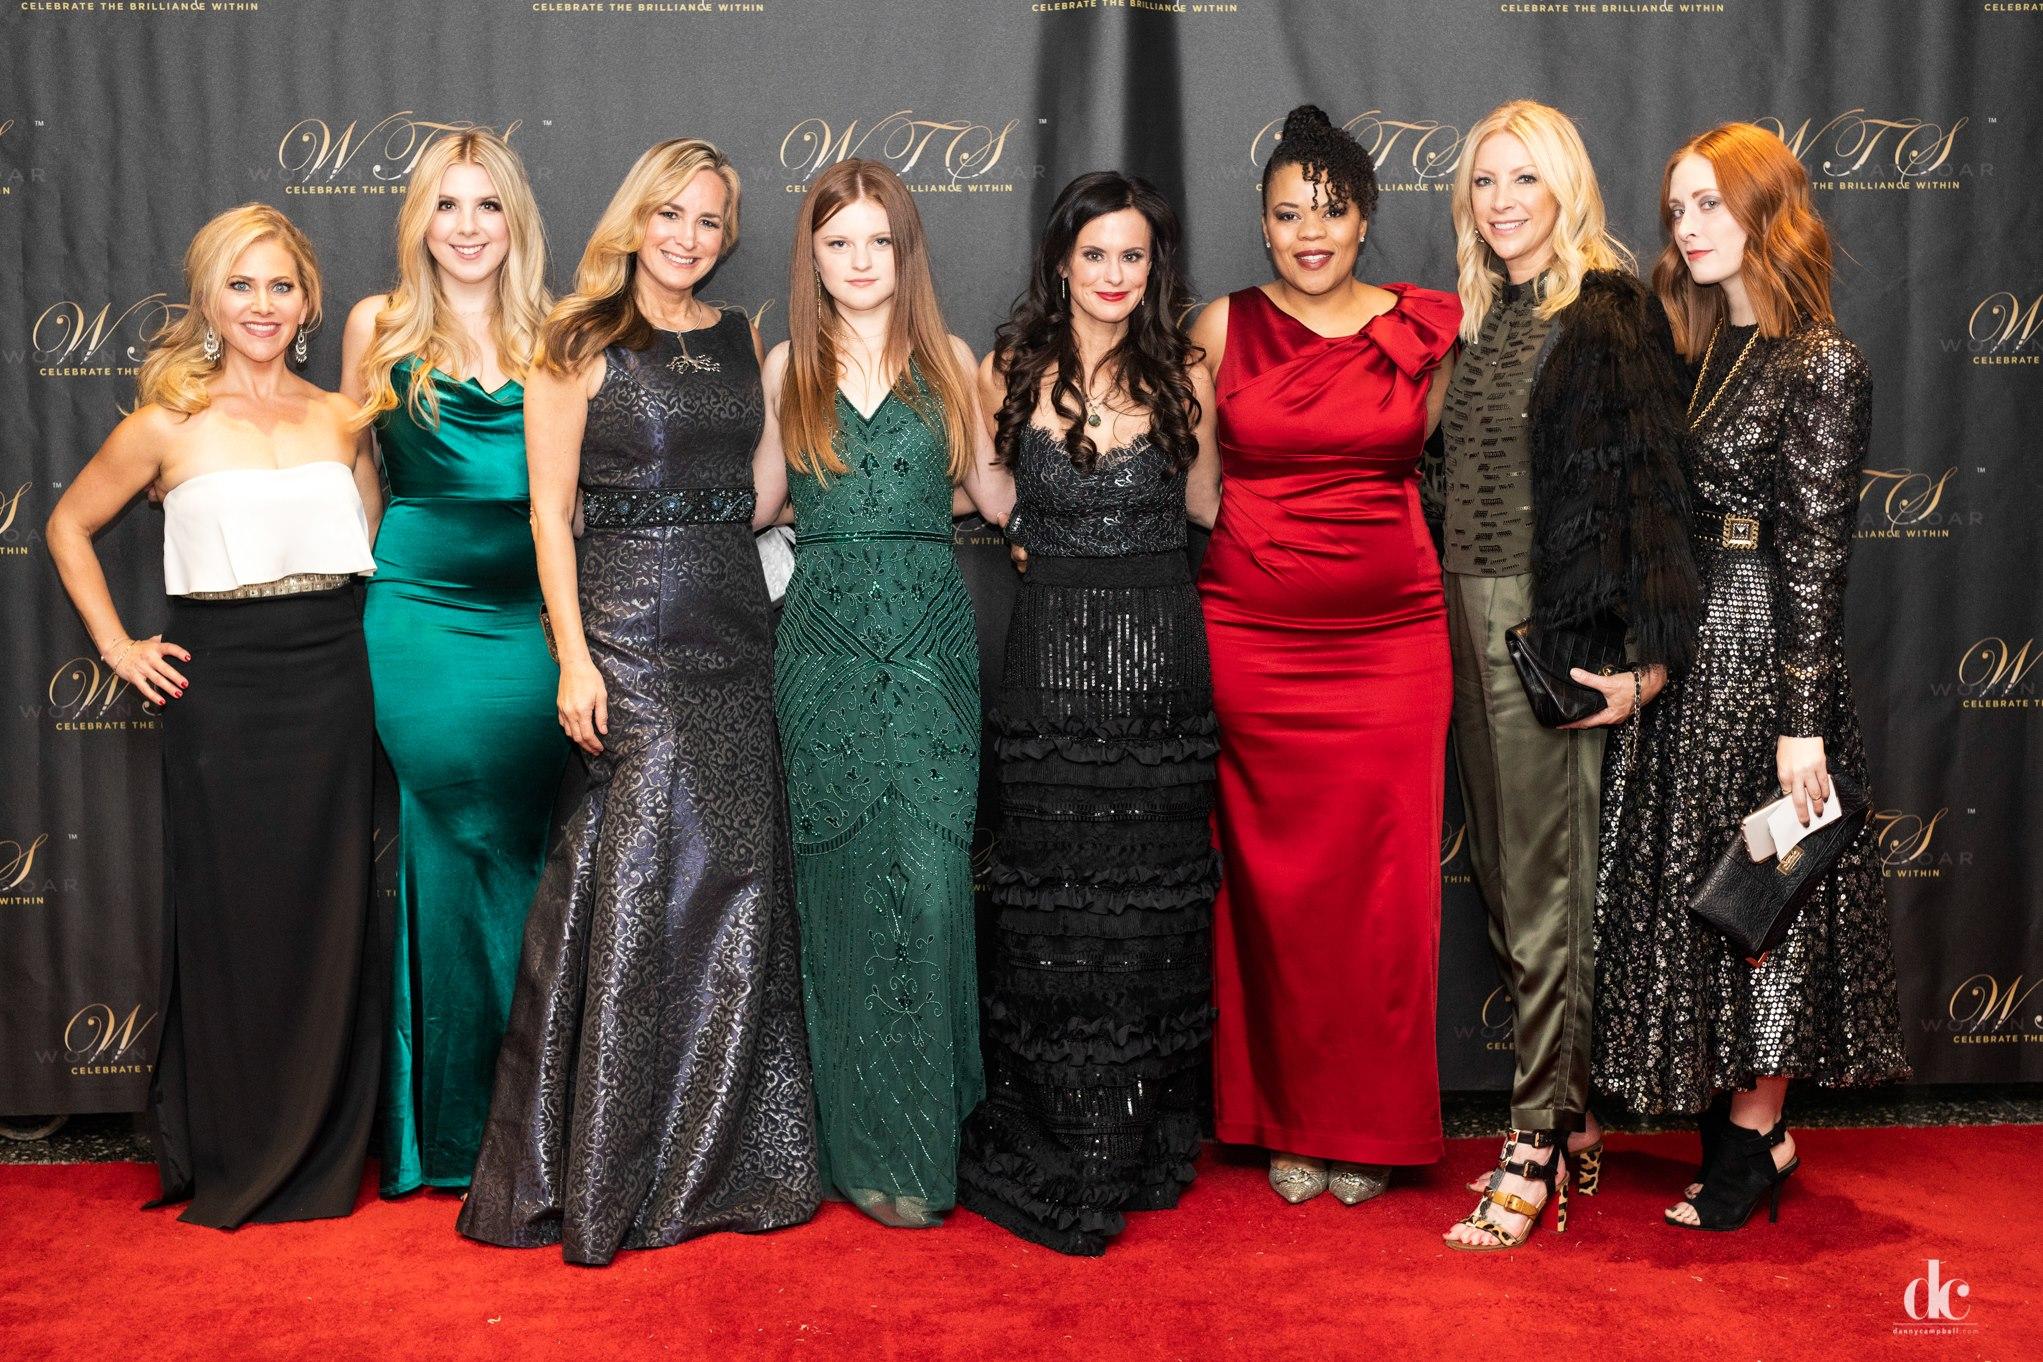 Gala Season ~ Fashion from The Women That Soar Awards